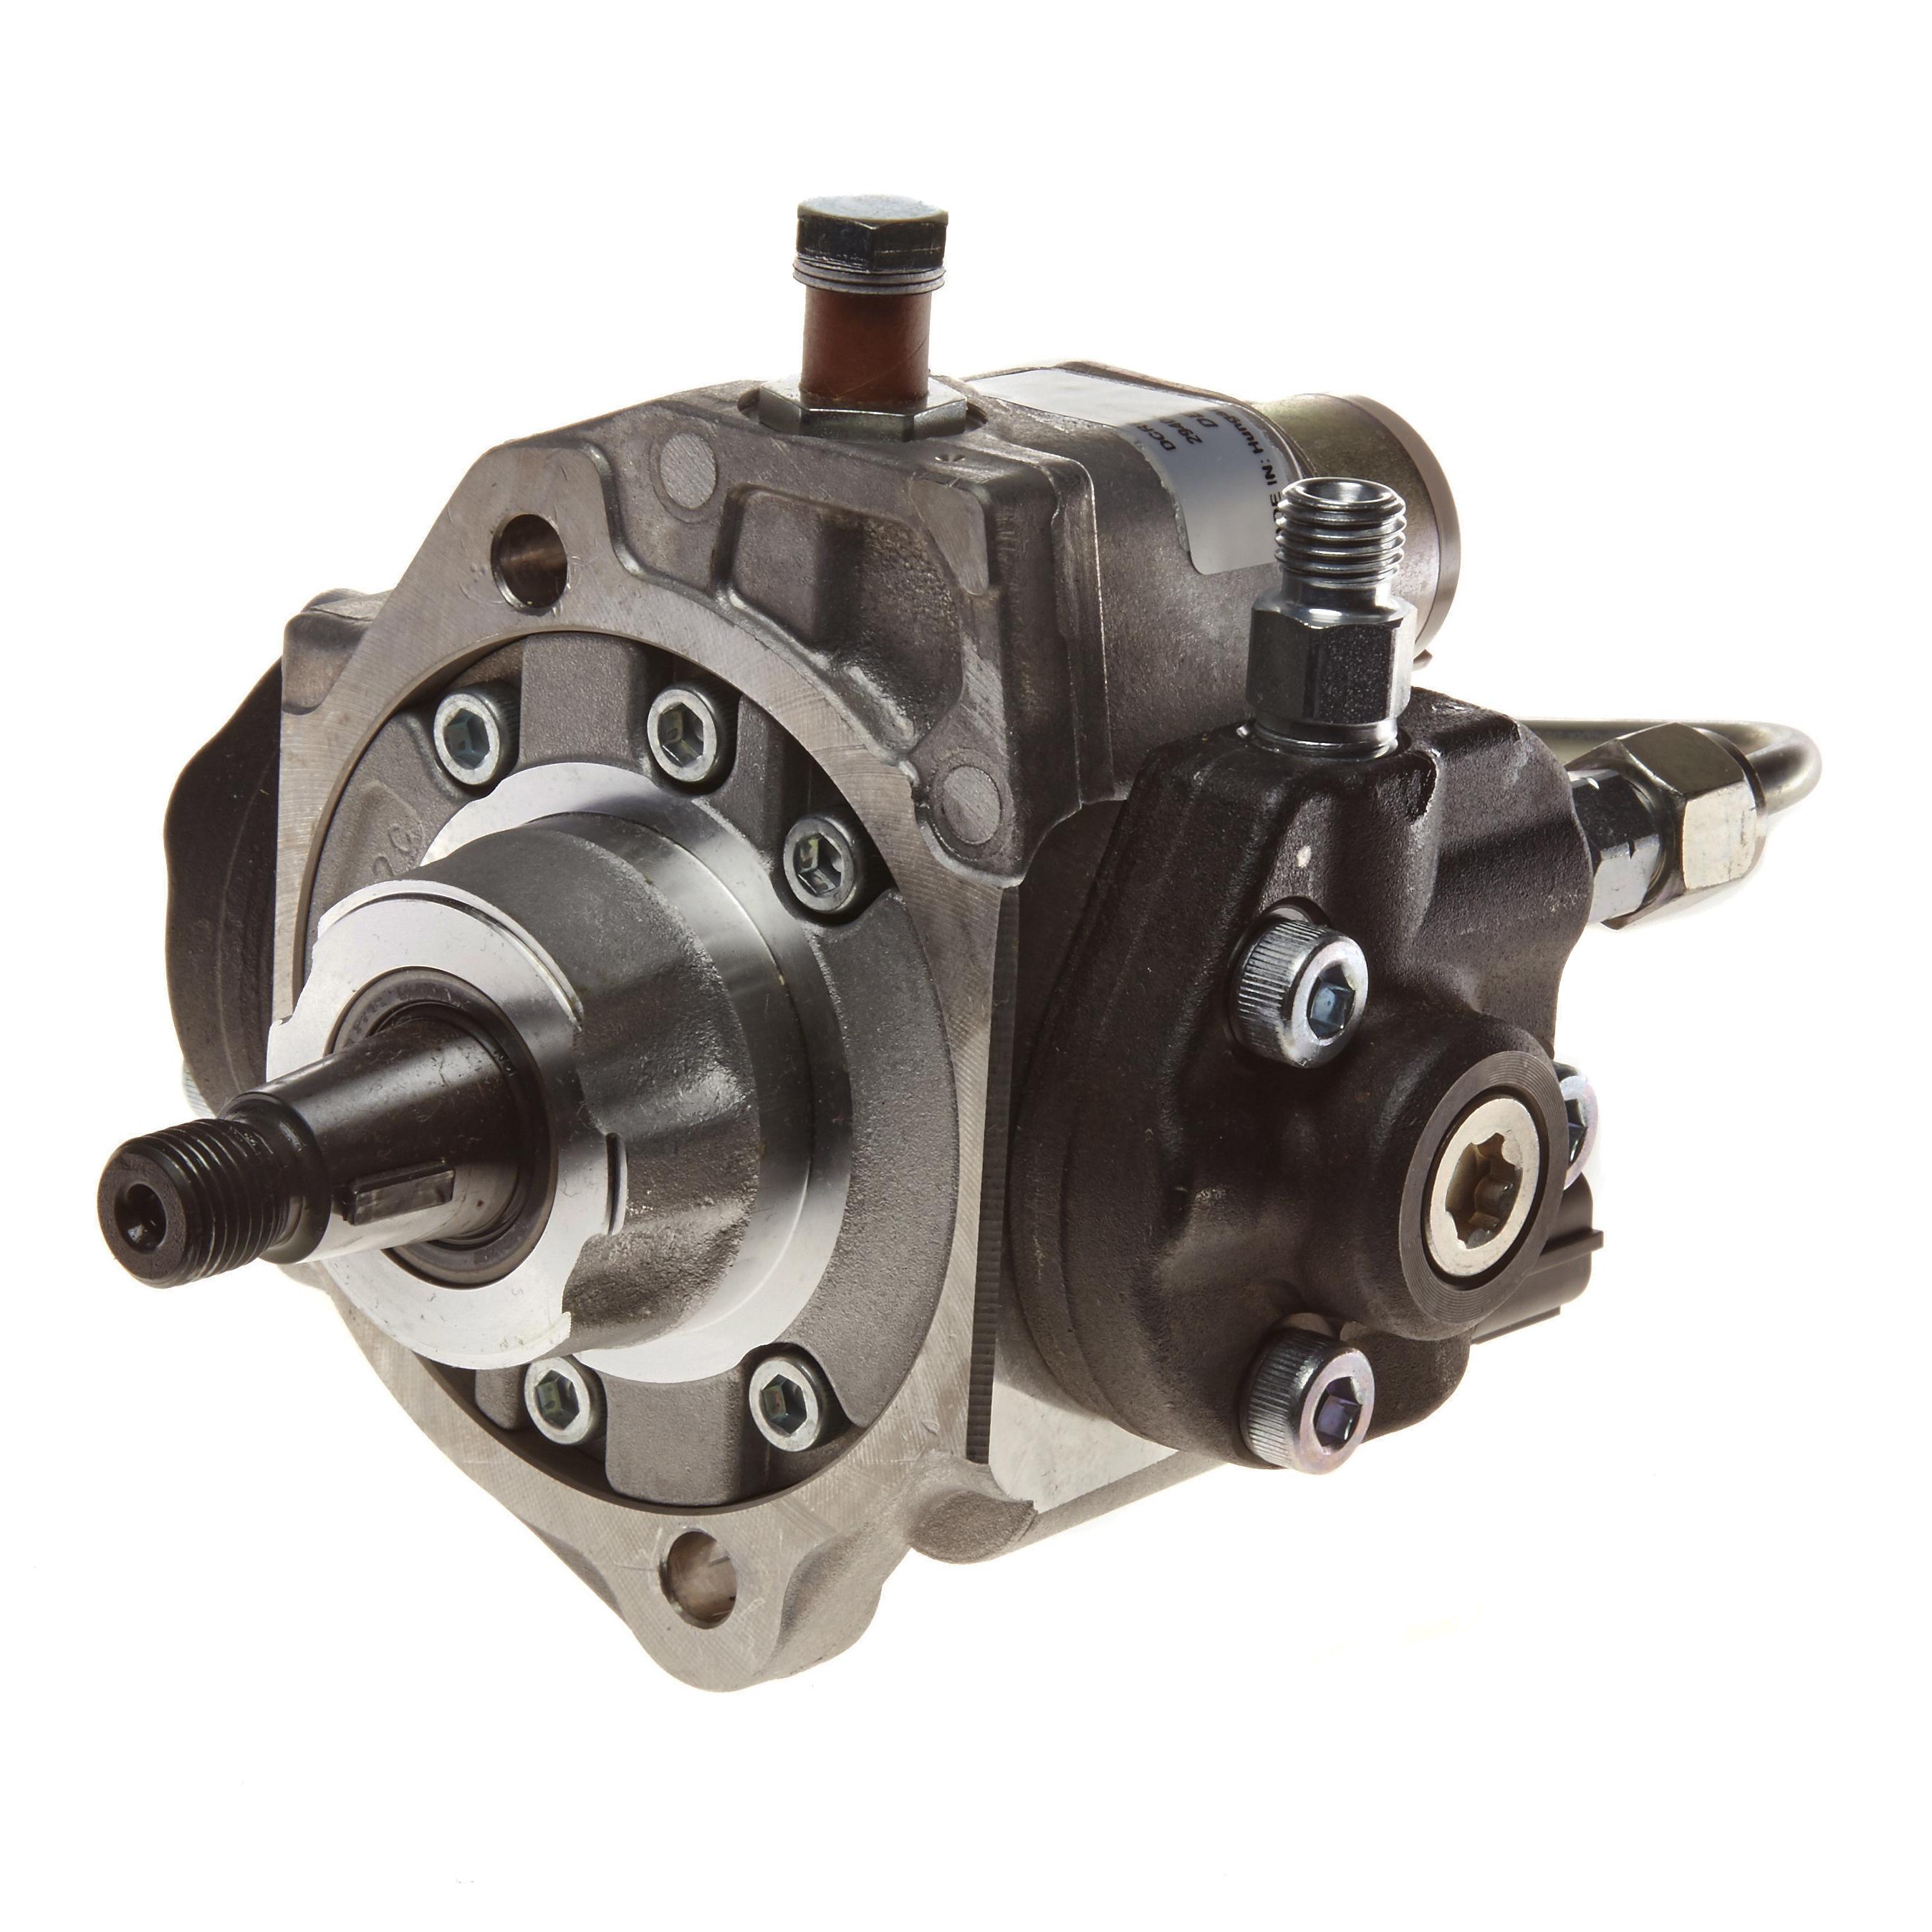 denso dcrp301010 diesel fuel injection pump common rail high pressure ebay. Black Bedroom Furniture Sets. Home Design Ideas